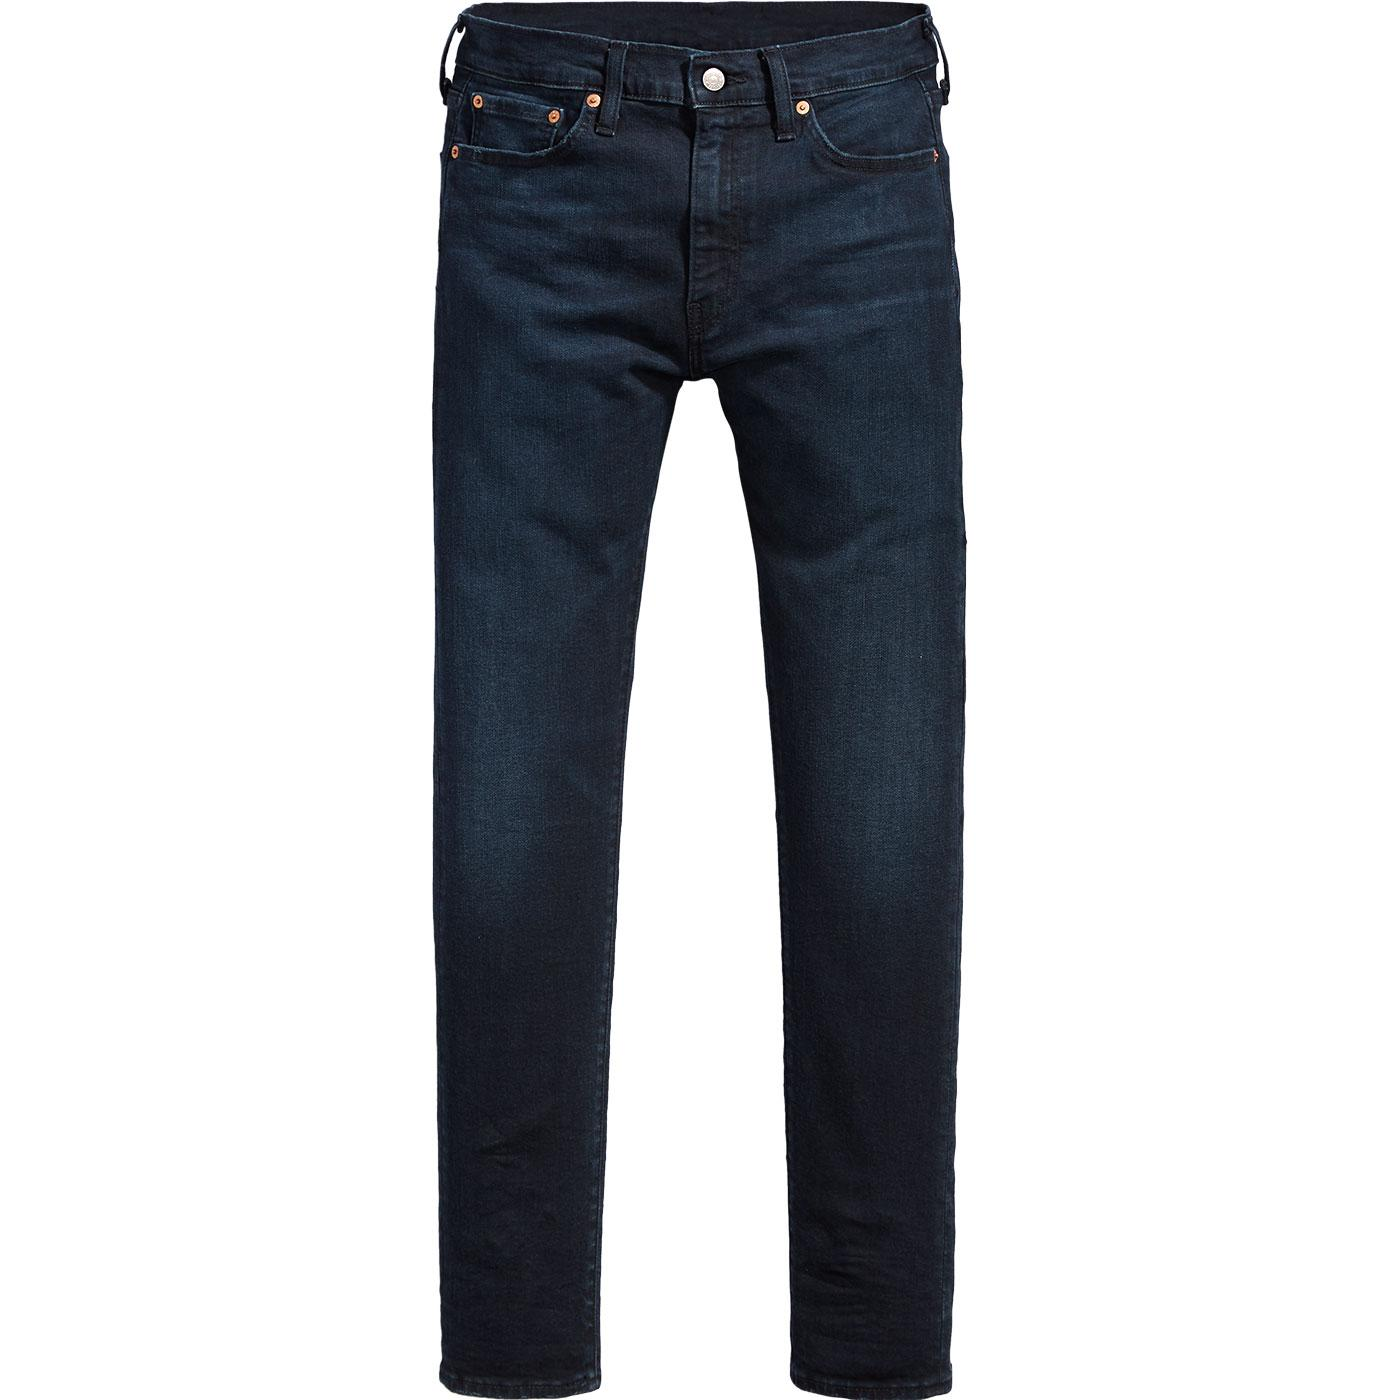 LEVI'S 511 Retro Mod Slim Denim Jeans (Rajah Adv)